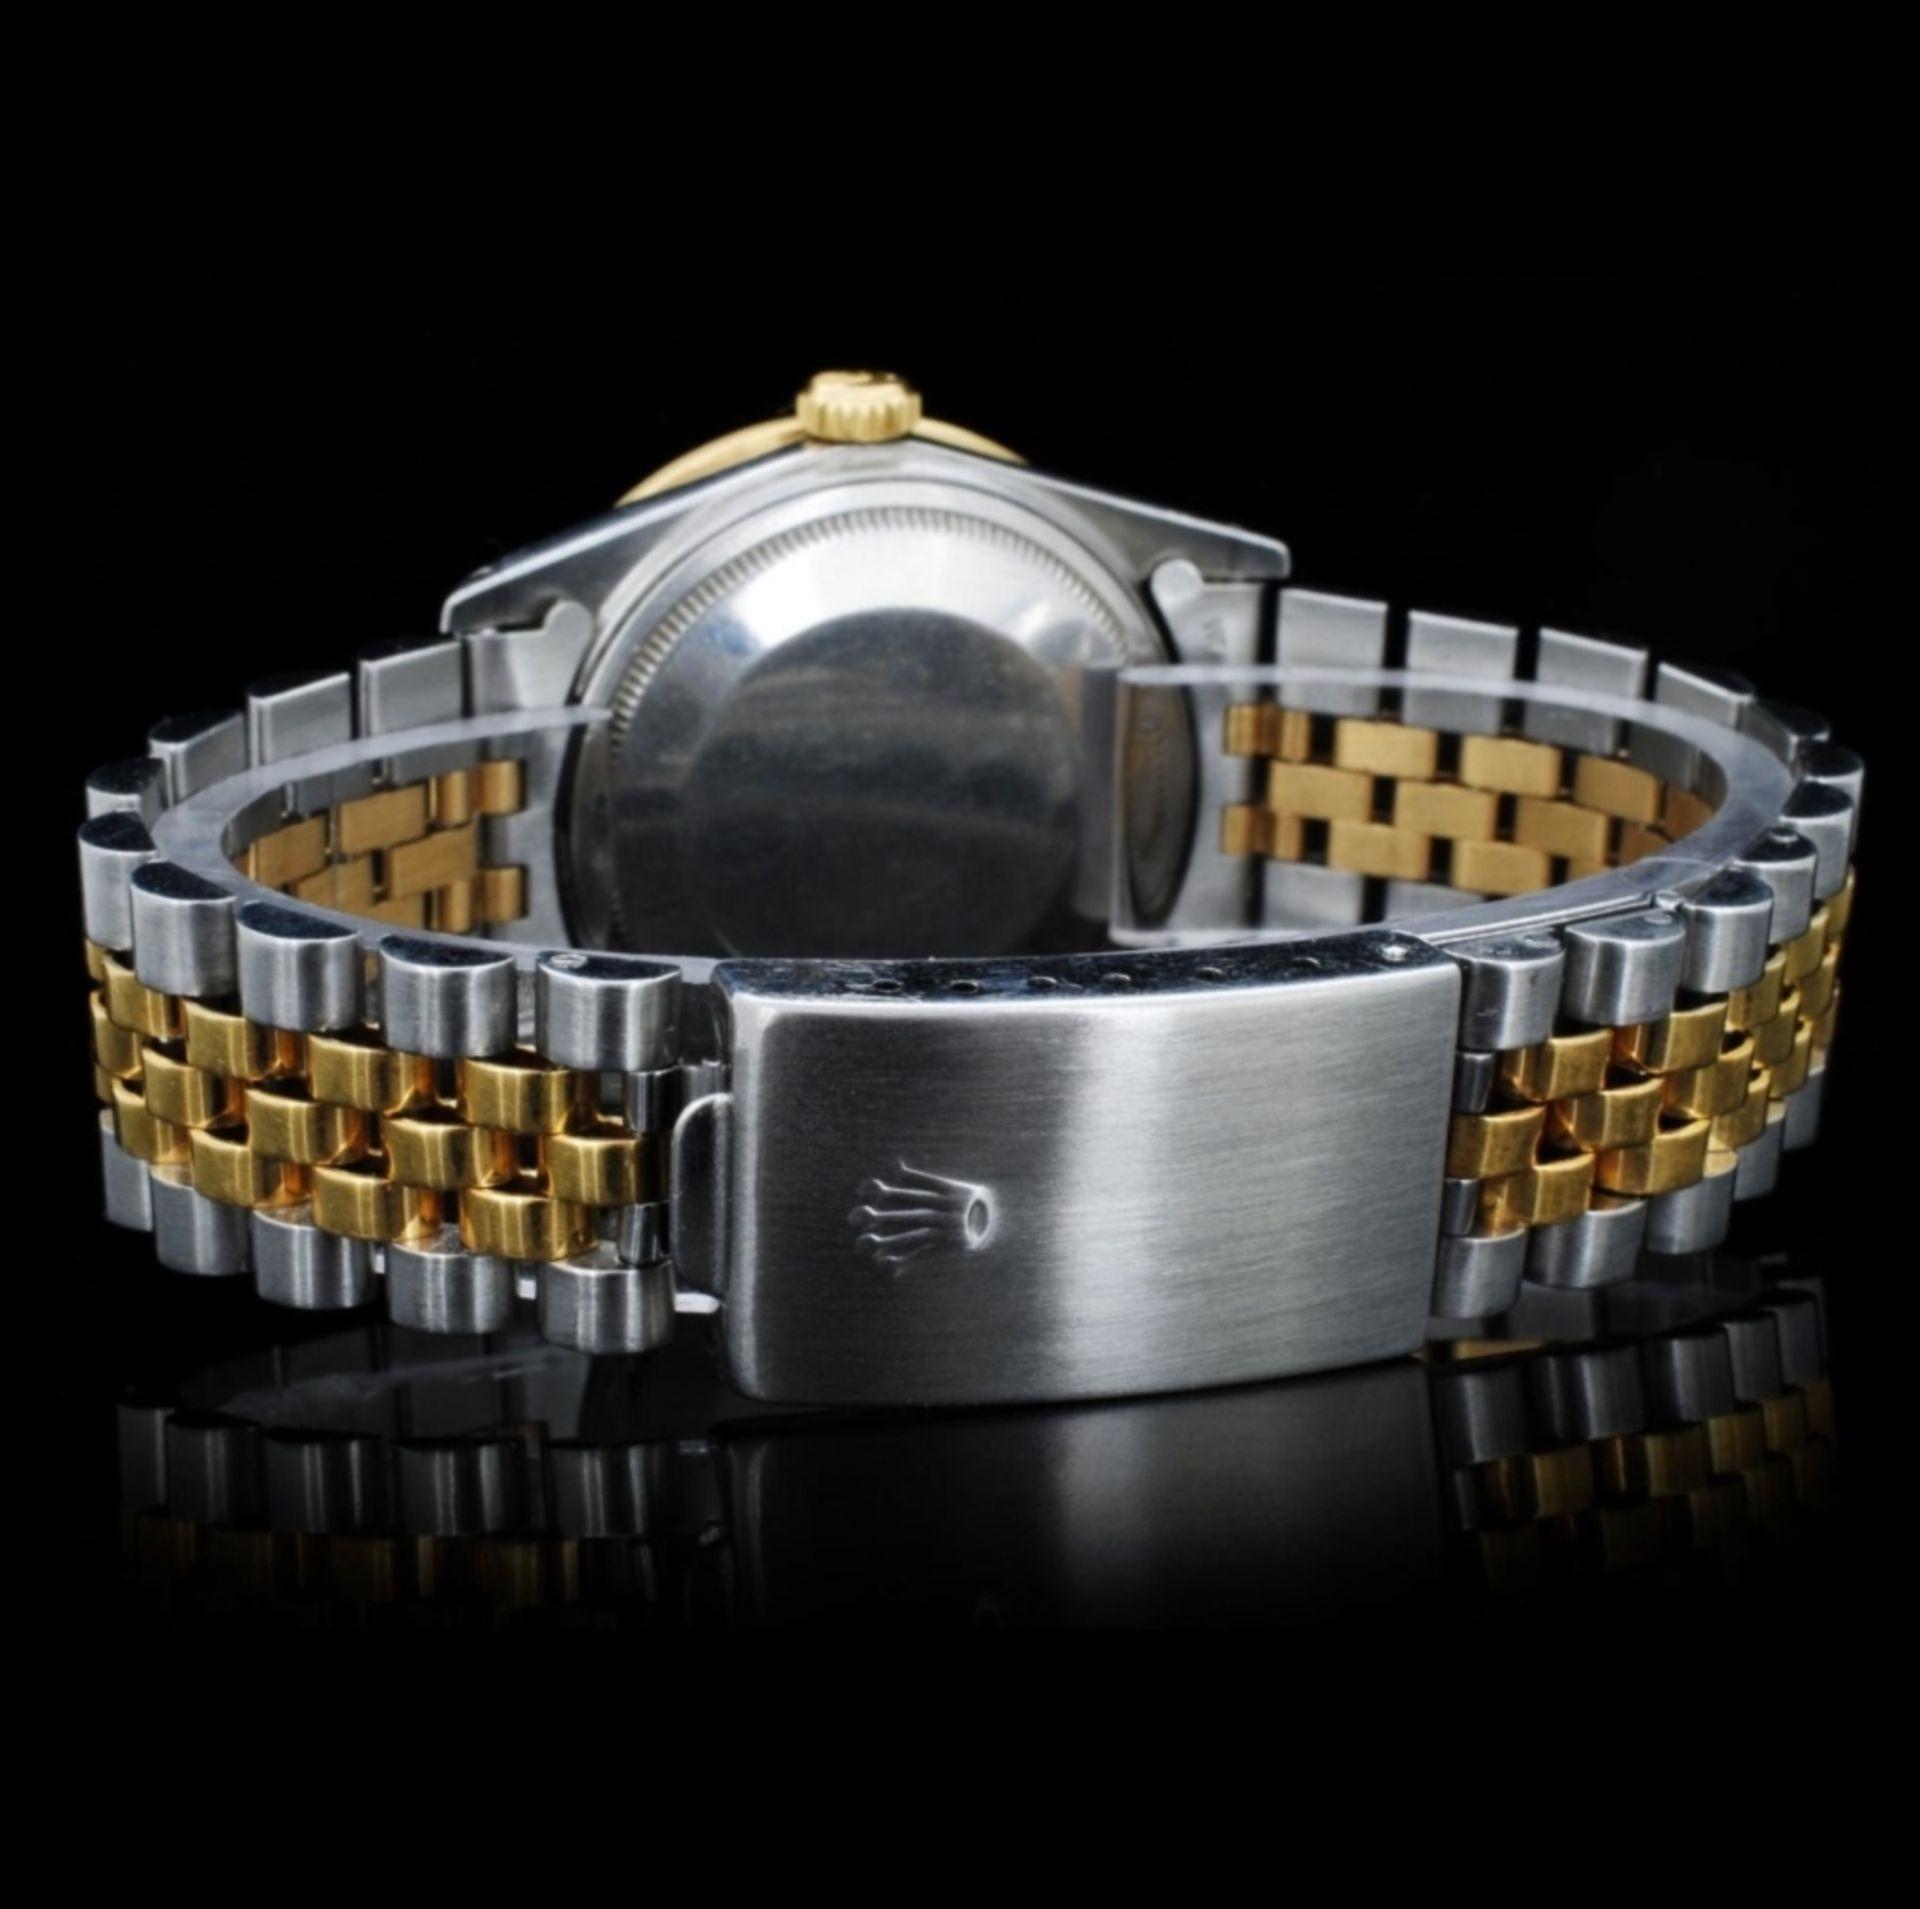 Rolex YG/SS DateJust Diamond 36MM Watch - Image 4 of 6